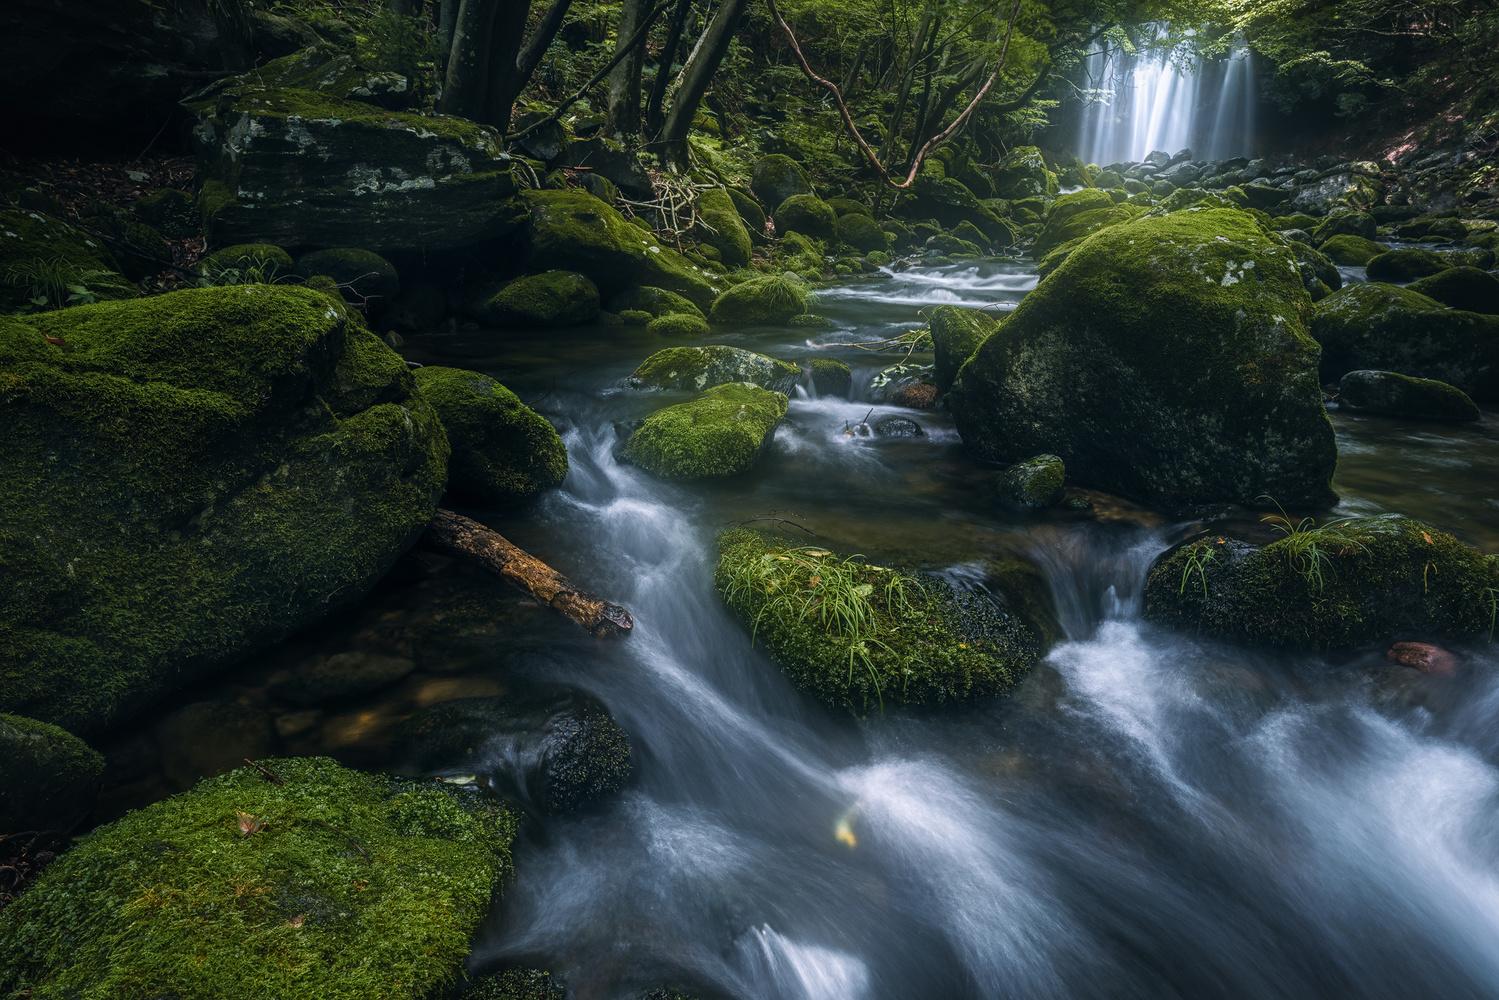 Otome Falls by Shumon Saito